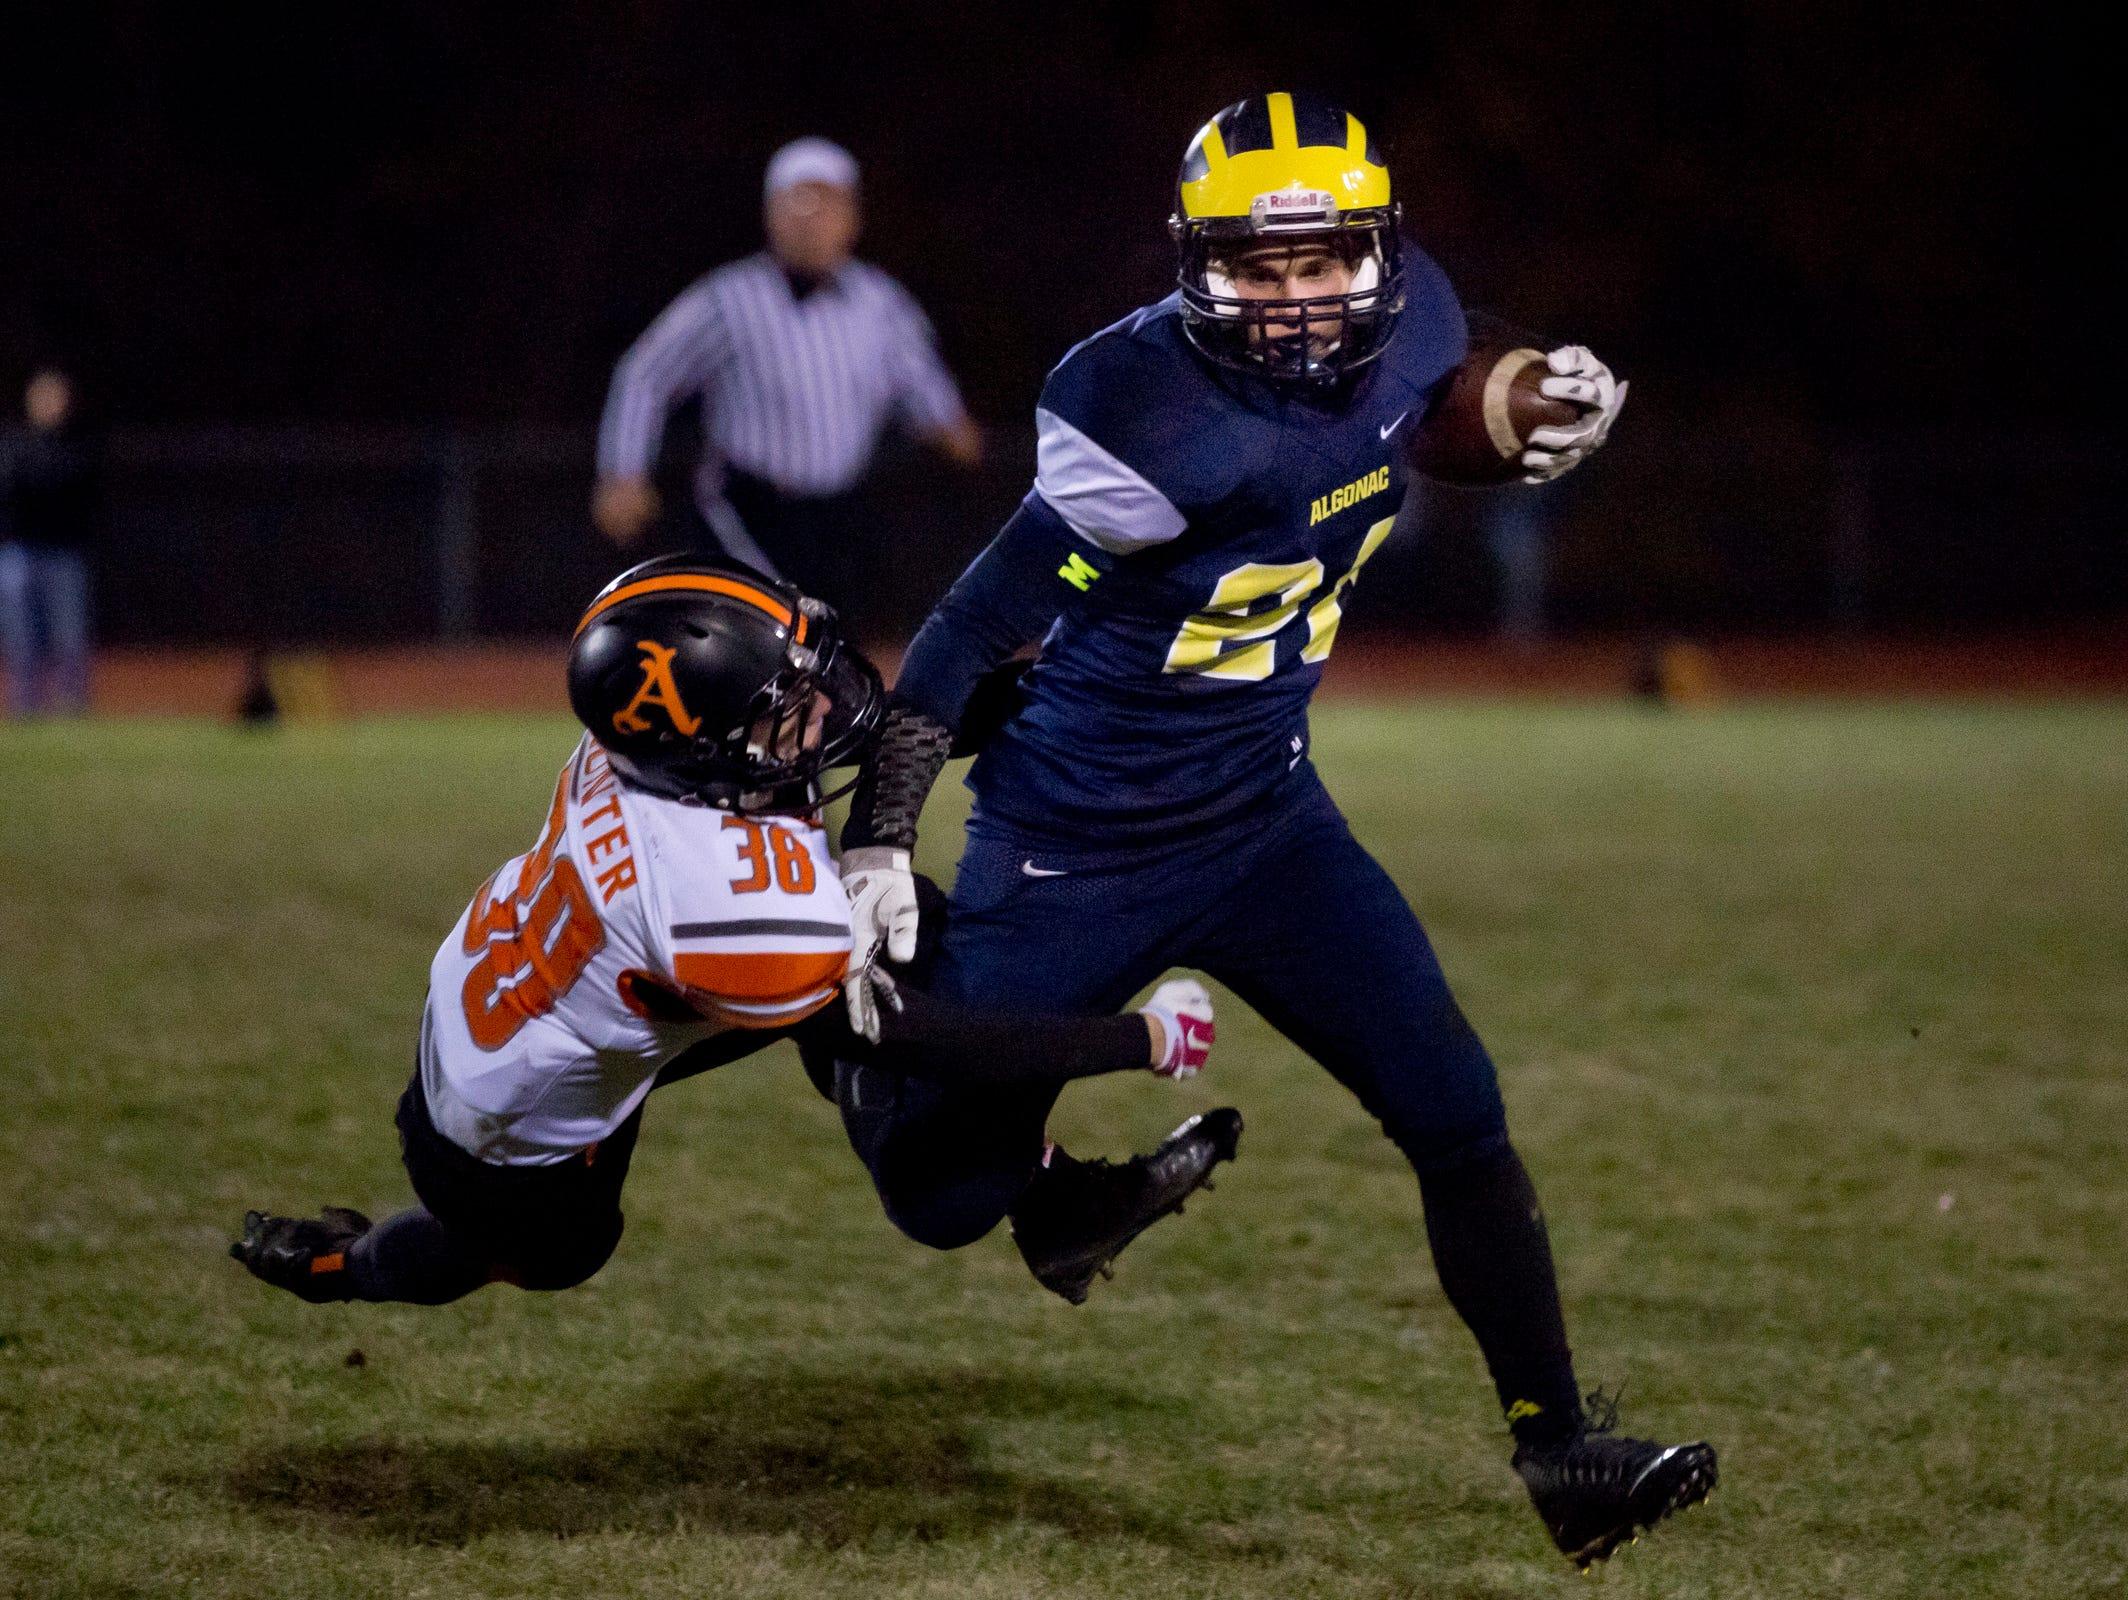 Algonac's Joe McKee runs the ball and breaks a tackle by Almont's Nathan Hunter during a football game Friday, November 6, 2015 at Algonac High School.